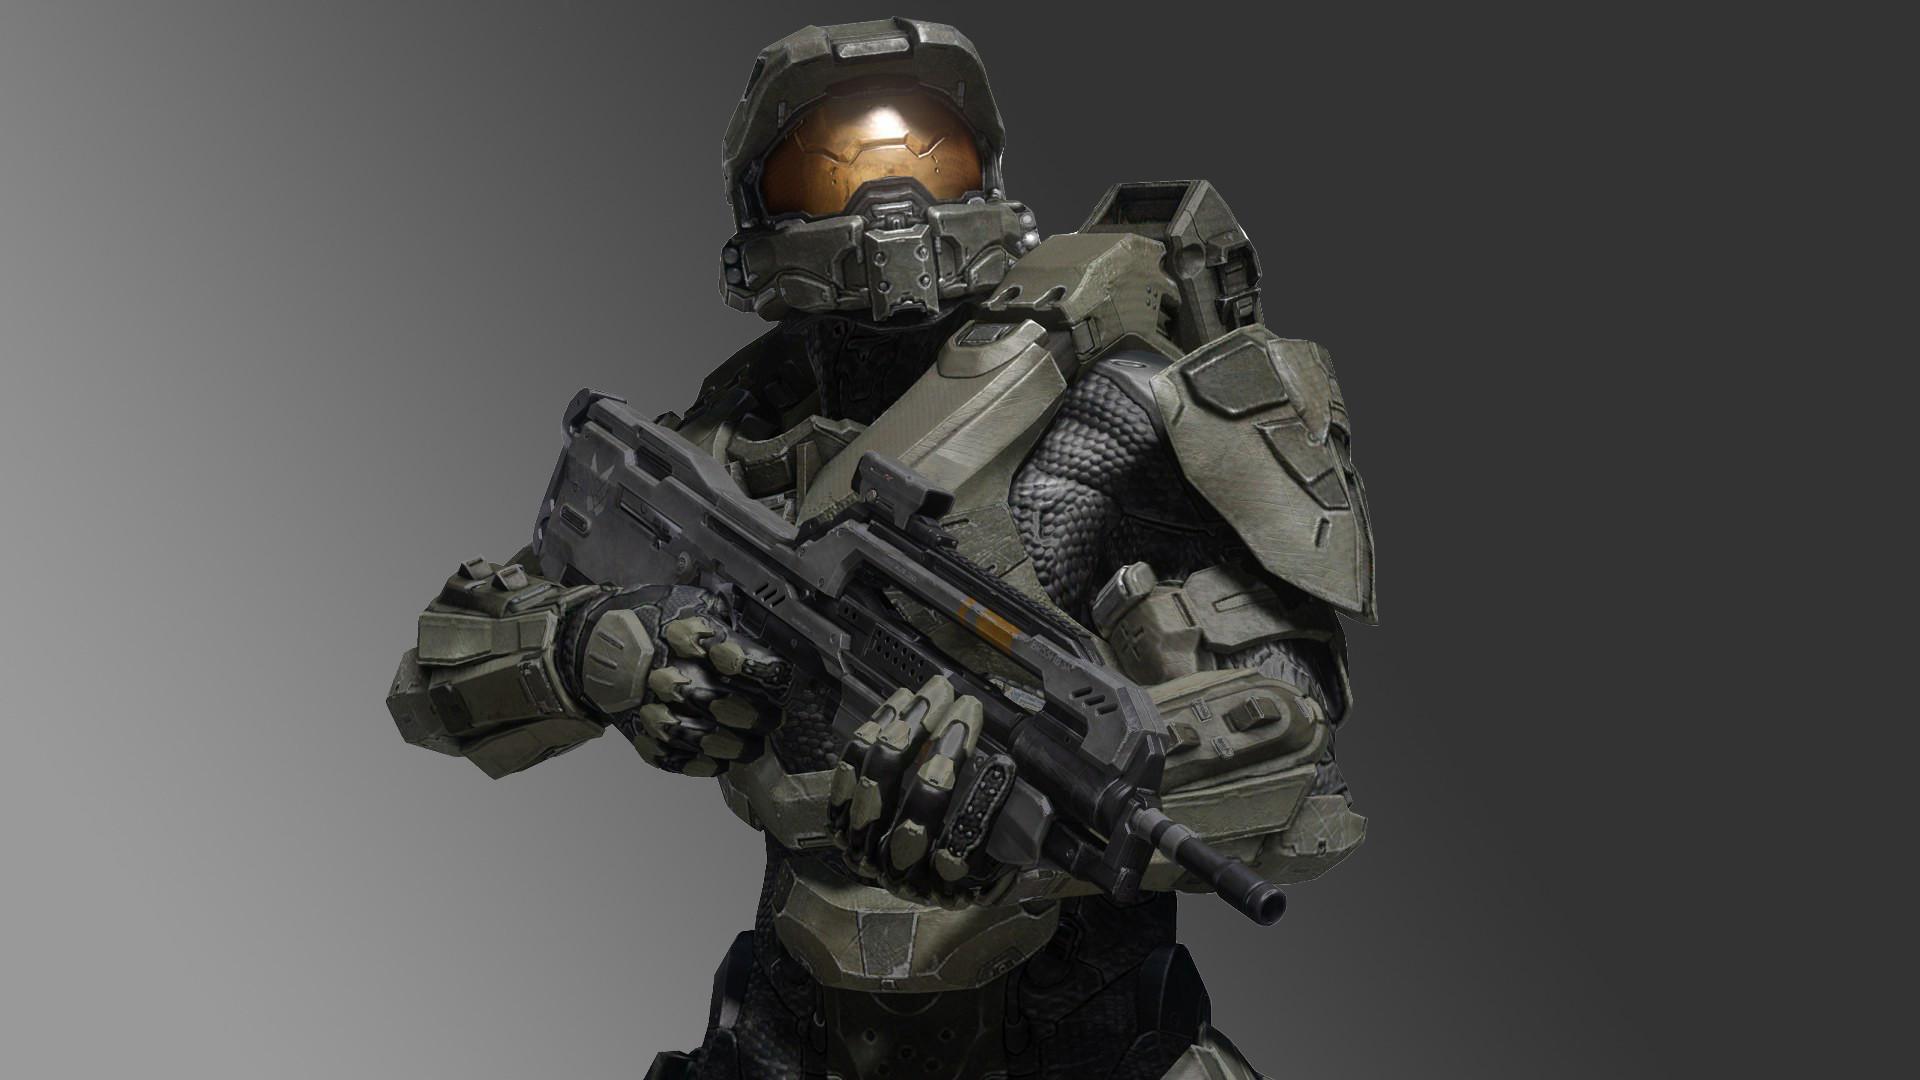 Game Halo 4 Master Chief Battle Rifle Gradient Spartan Halo Wallpaper .